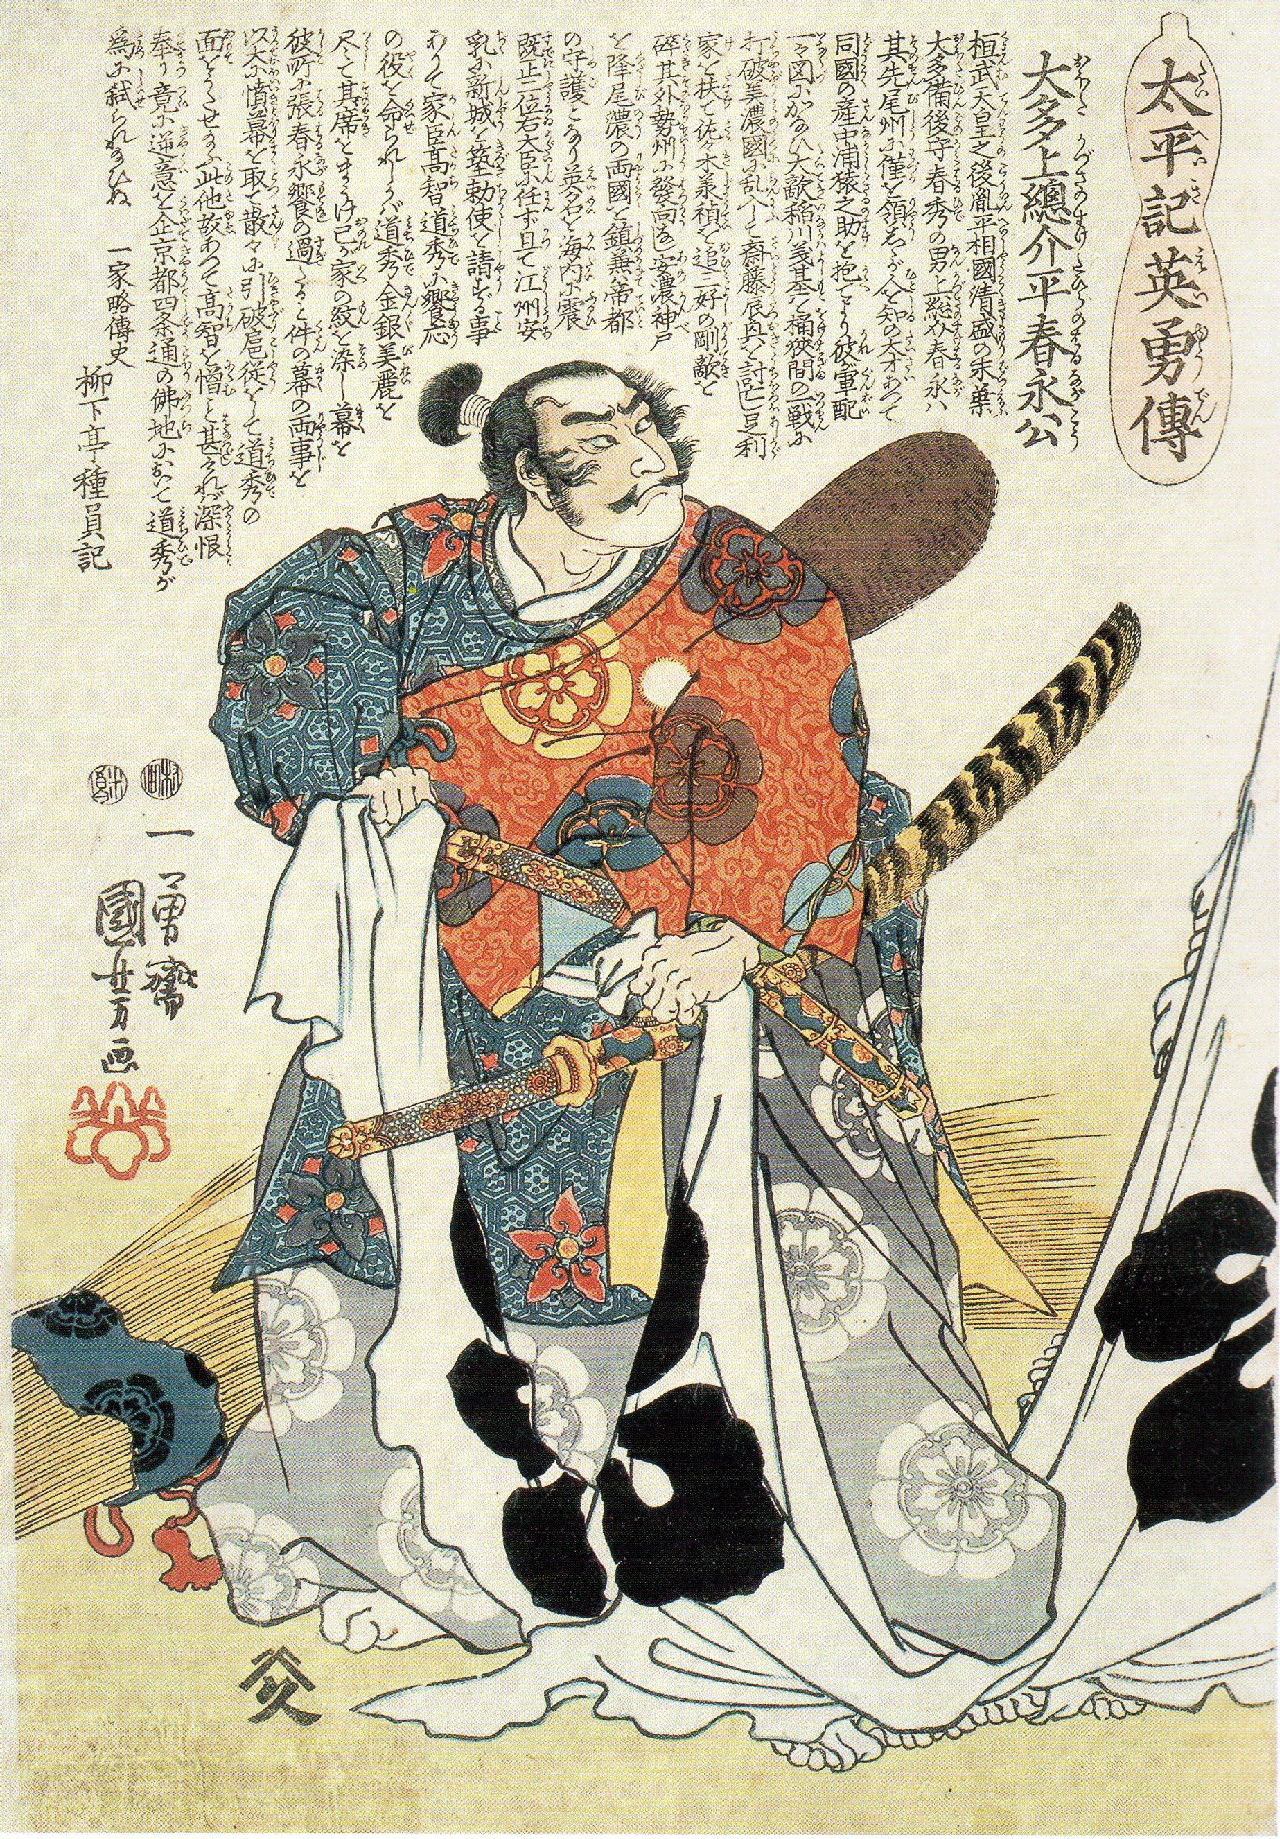 Shogun Oda Nobunaga (織田 信長)